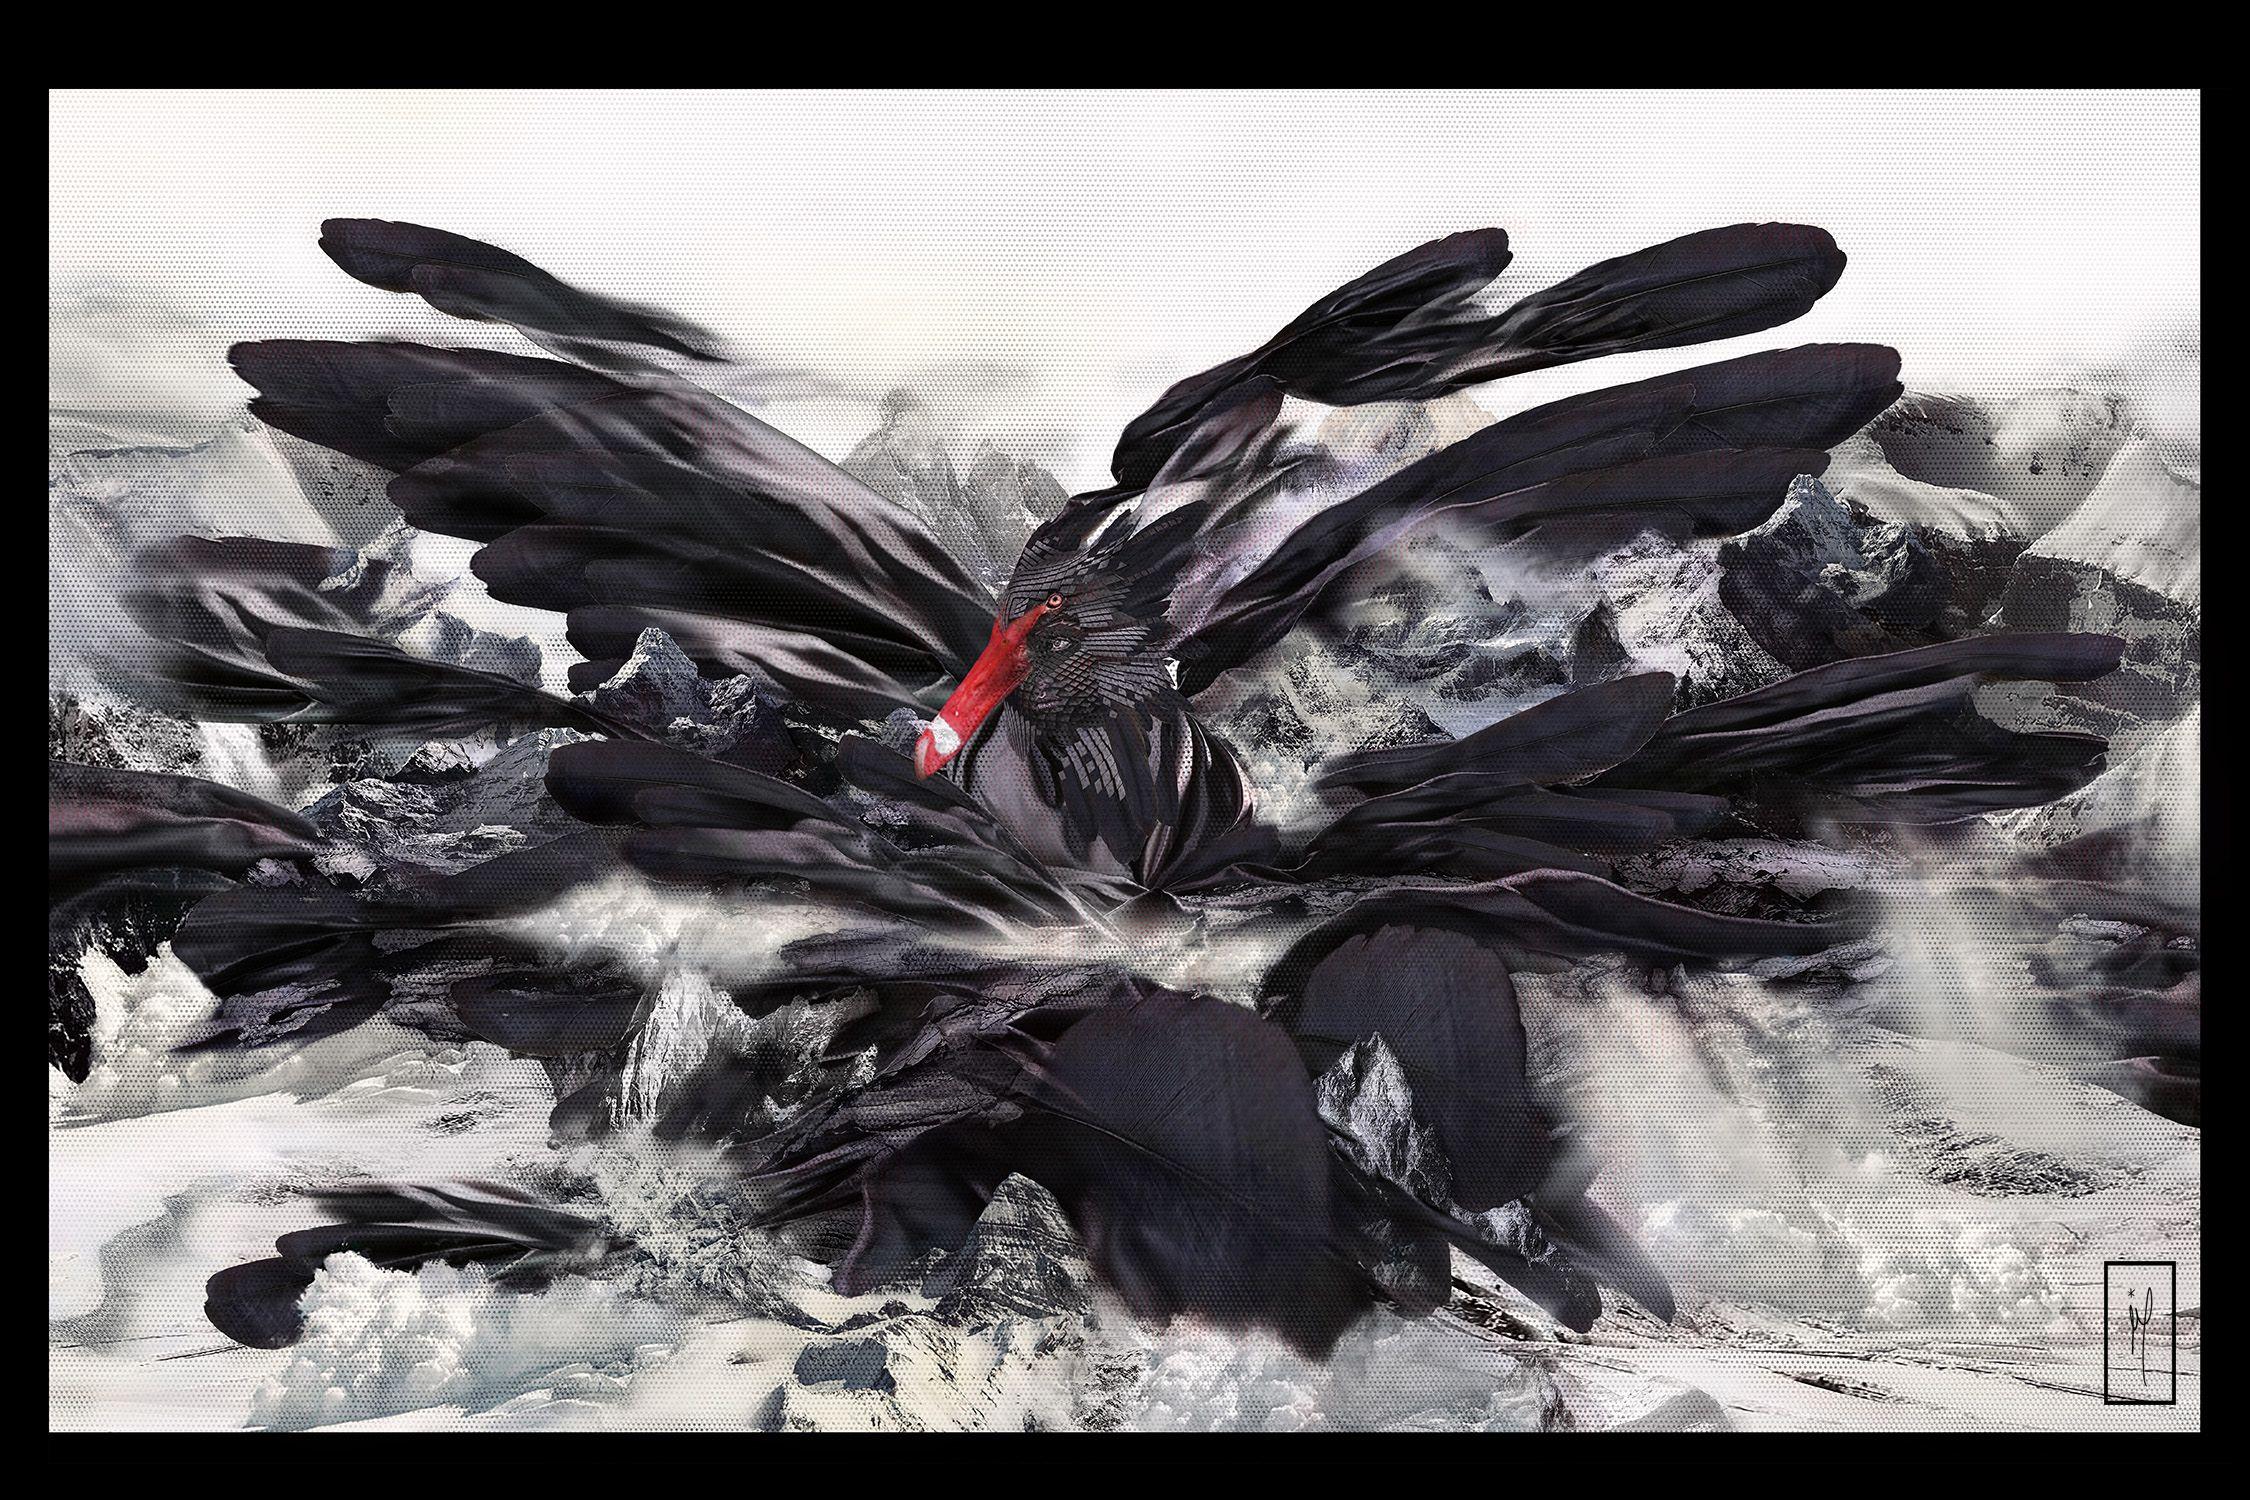 THE RISE OF THE BLACK SWAN https://society6.com/gabor_paszti https://www.curioos.com/gaborpaszti https://www.teepublic.com/user/gabor_paszti https://instagram.com/gabor.paszti https://www.facebook.com/GaborPasztiFunPage